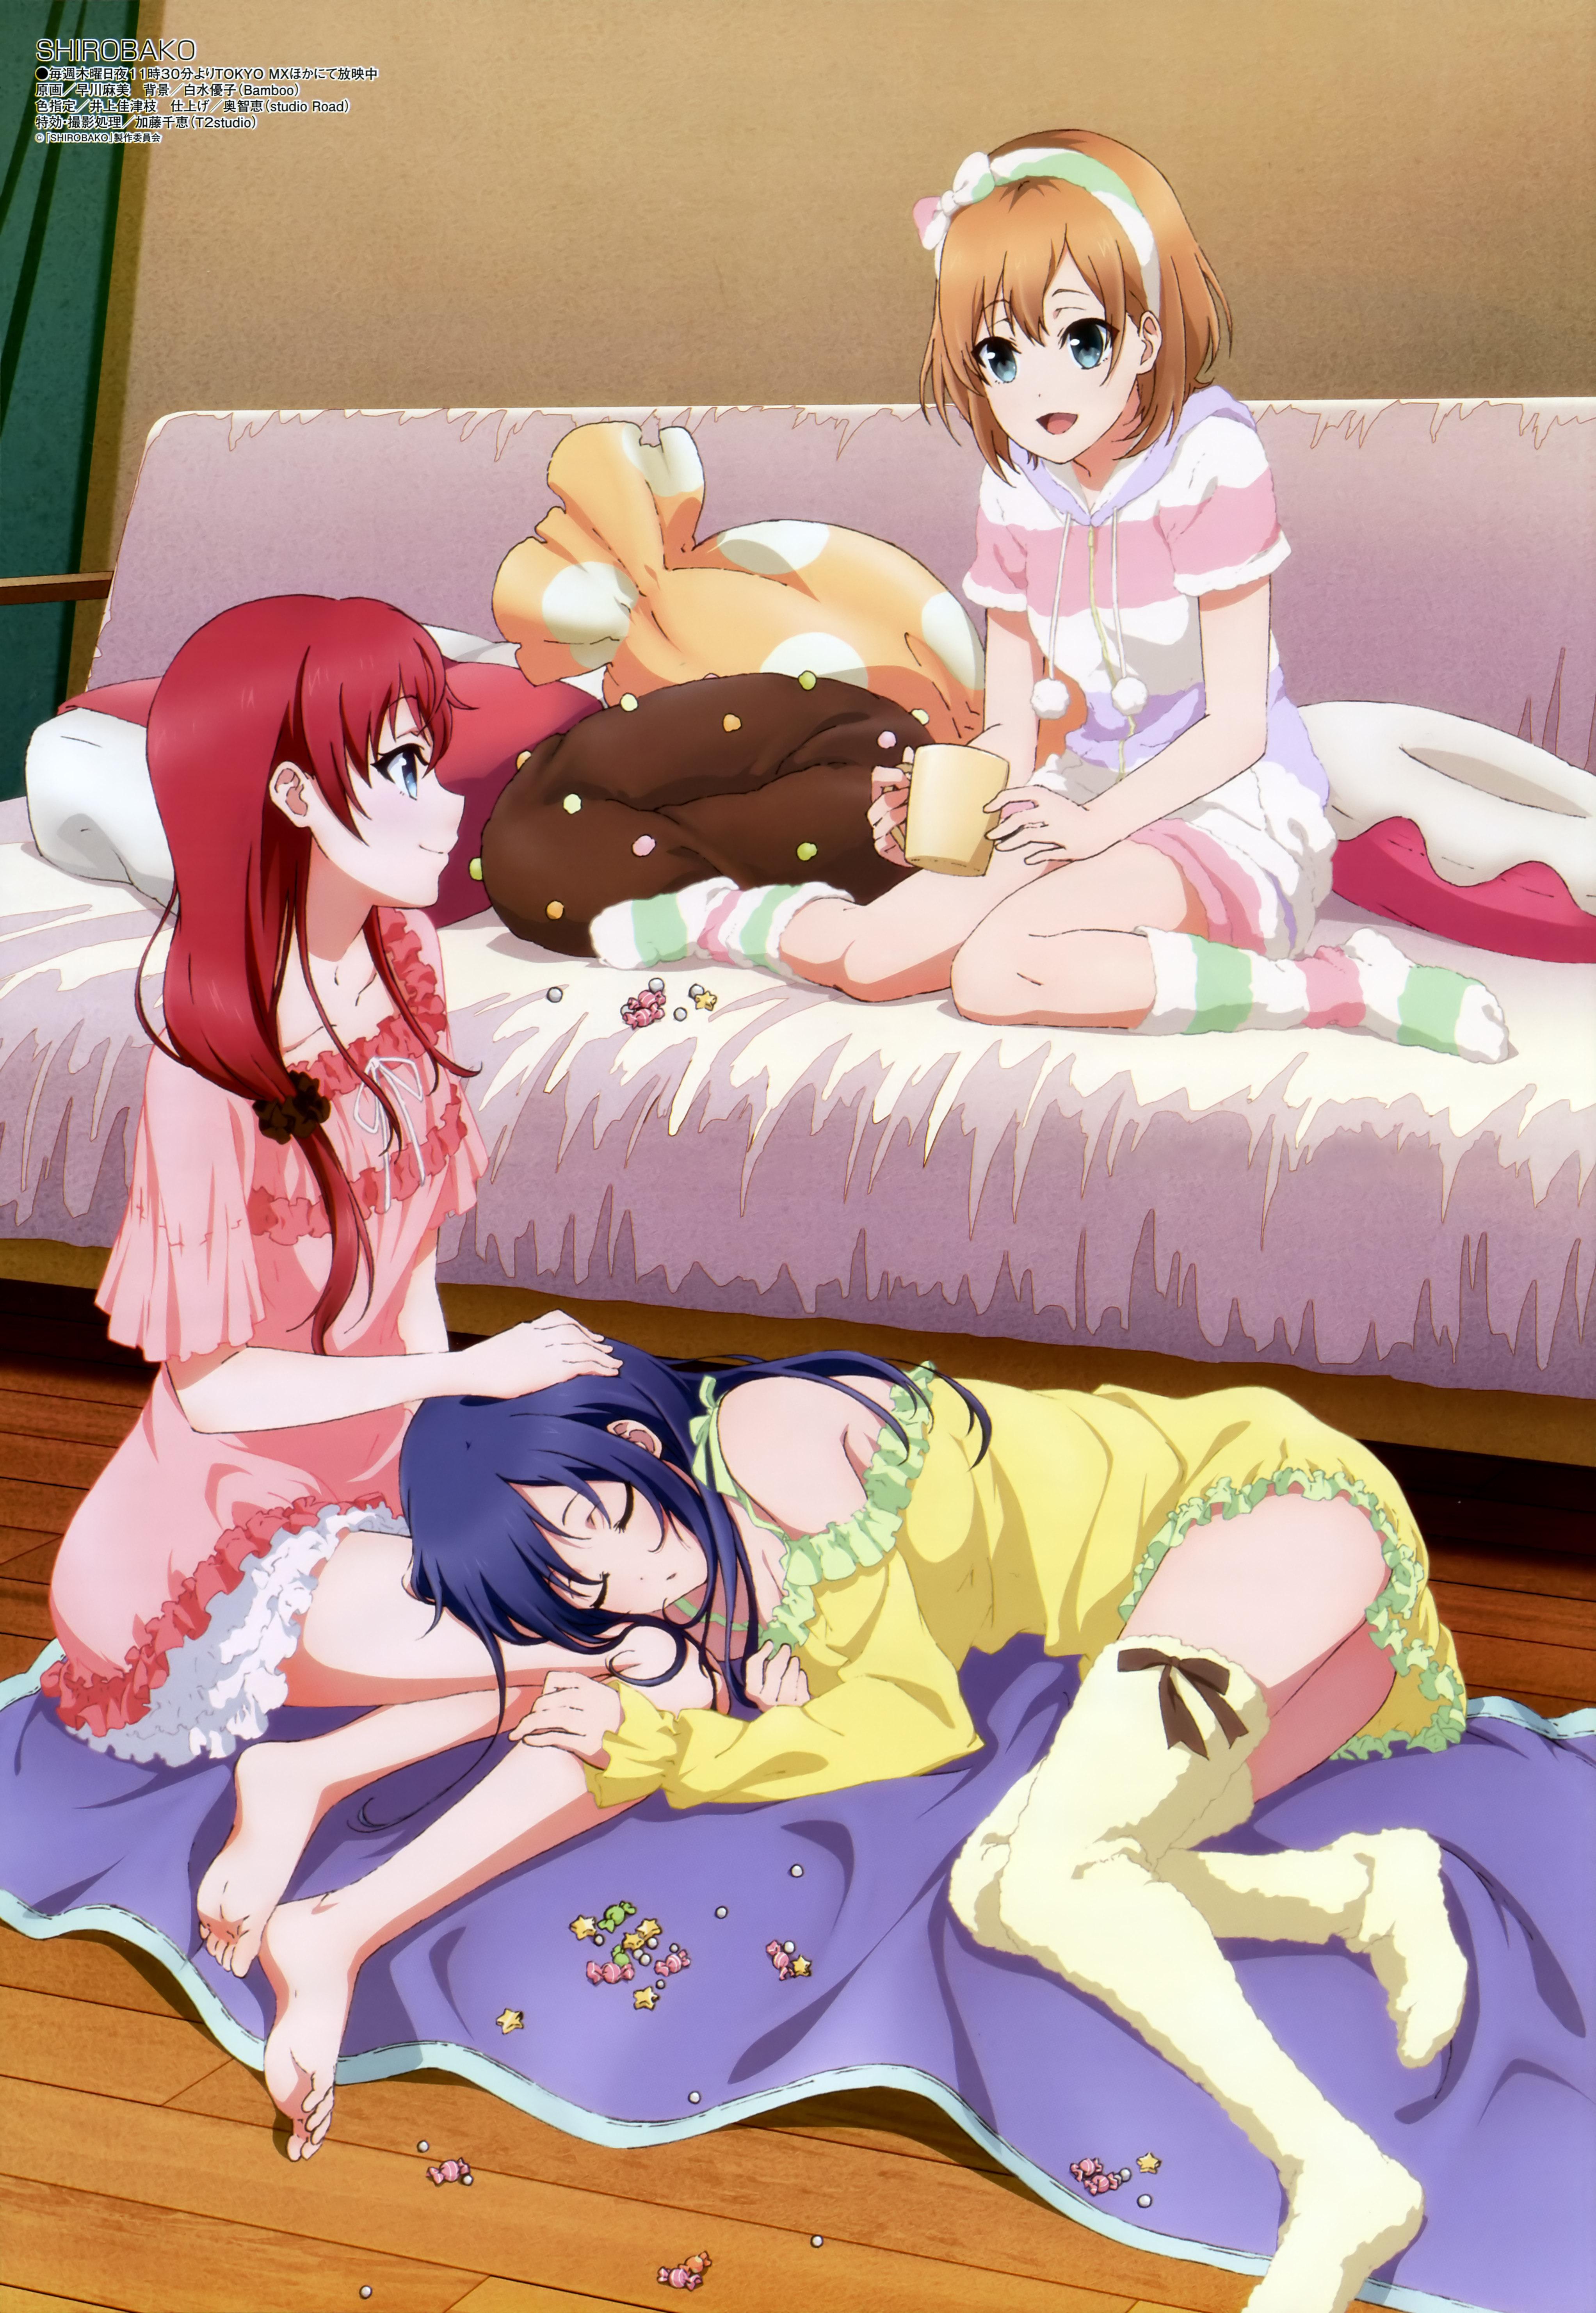 Megami MAGAZINE March 2015 anime posters Haruhichan.com shirobako poster